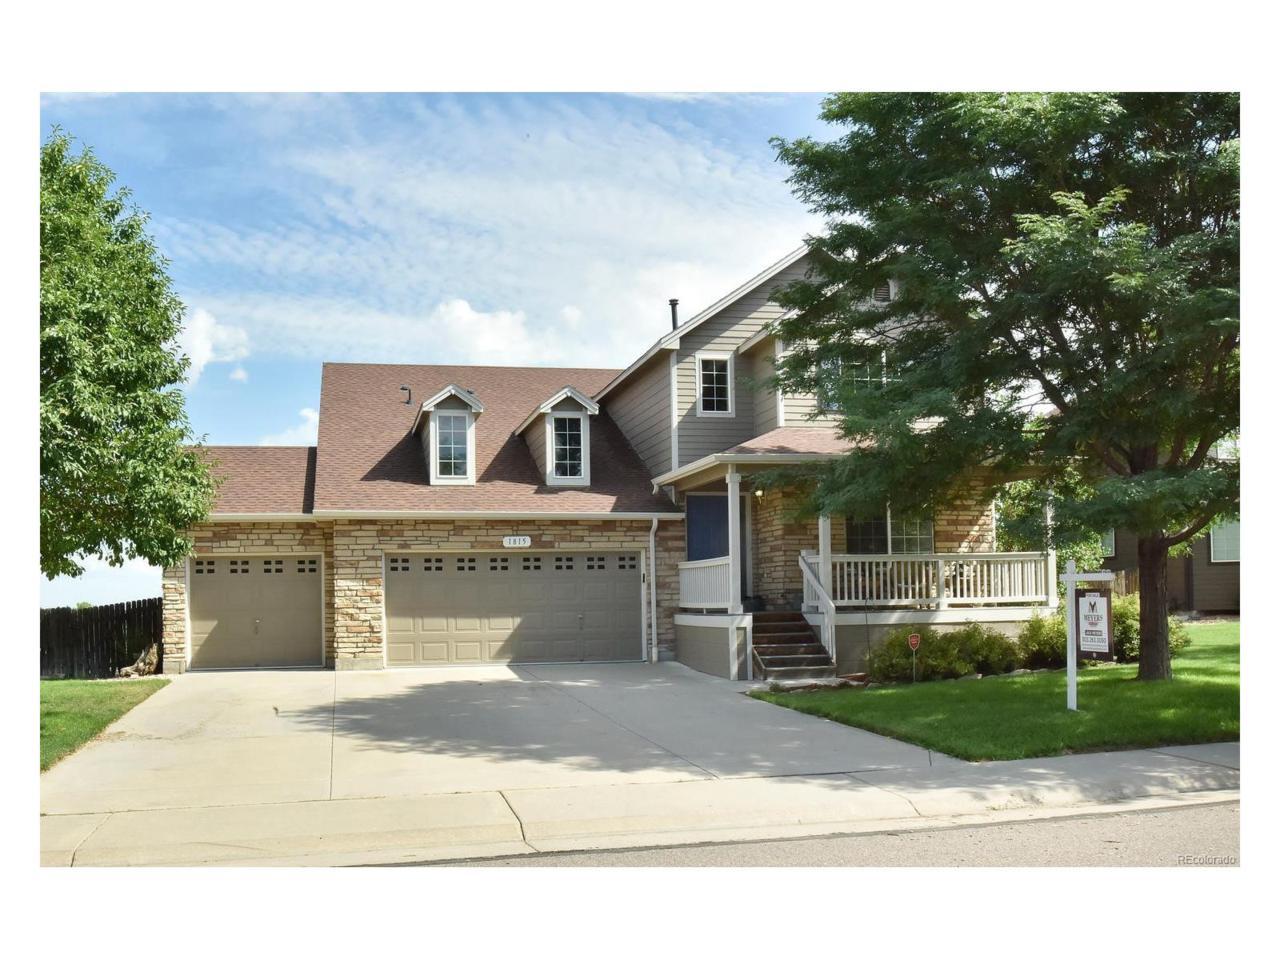 1815 E 144th Drive, Thornton, CO 80602 (MLS #4725380) :: 8z Real Estate